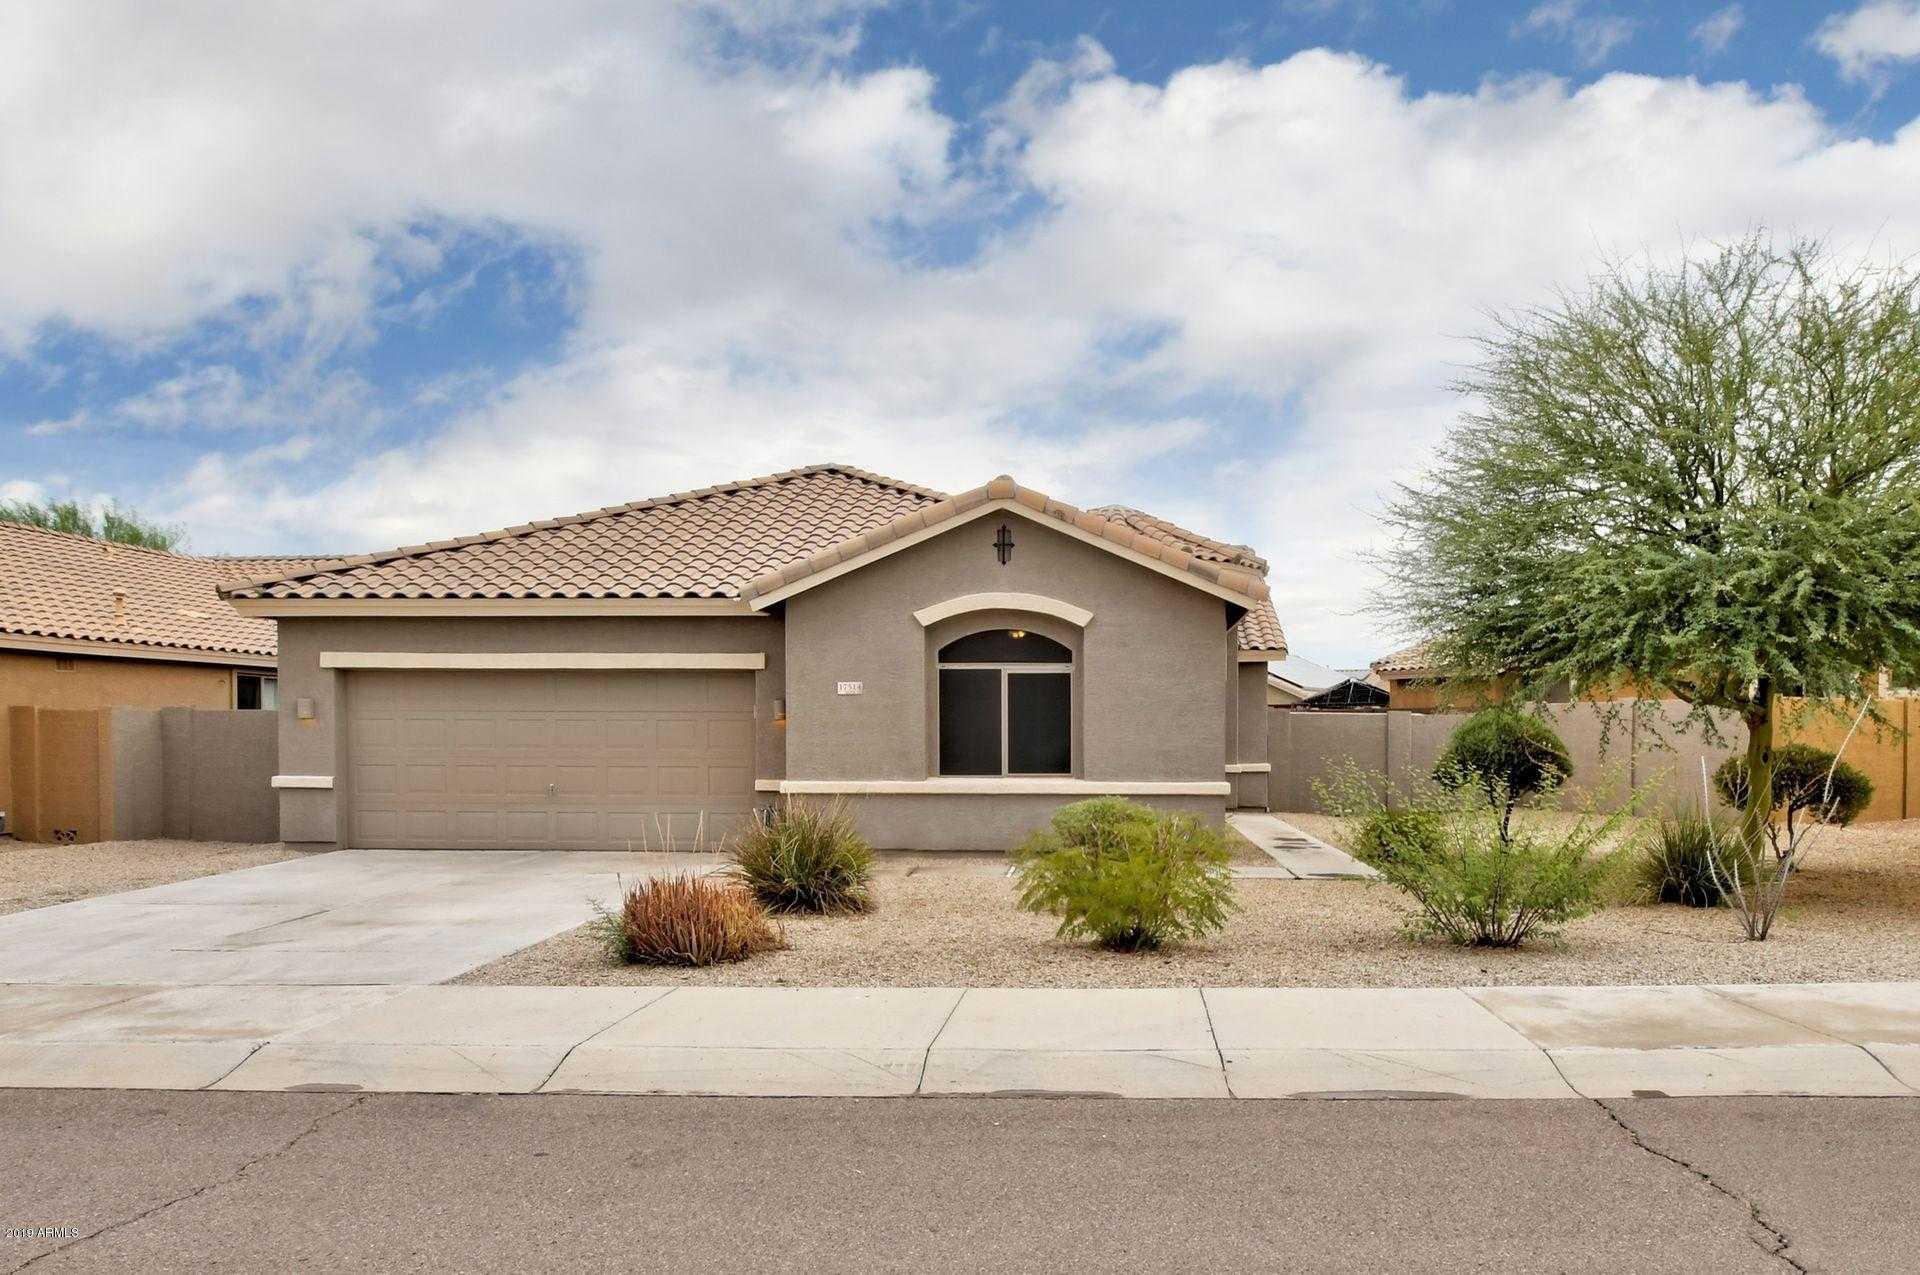 $259,900 - 4Br/2Ba - Home for Sale in Estrella Mountain Ranch Parcel 201, Goodyear